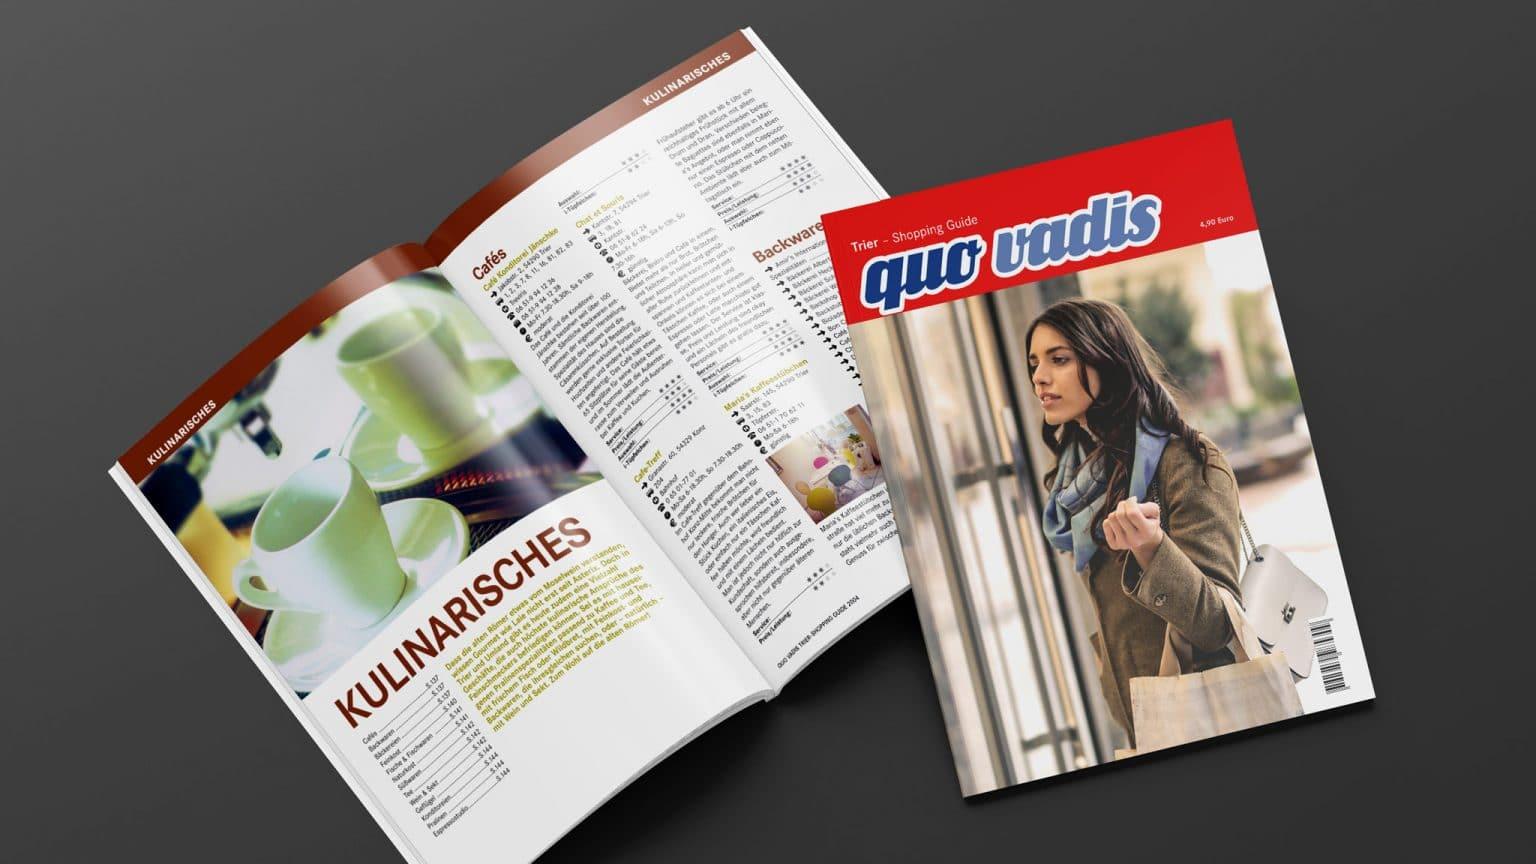 Shopping Guide Quo Vadis für Trier